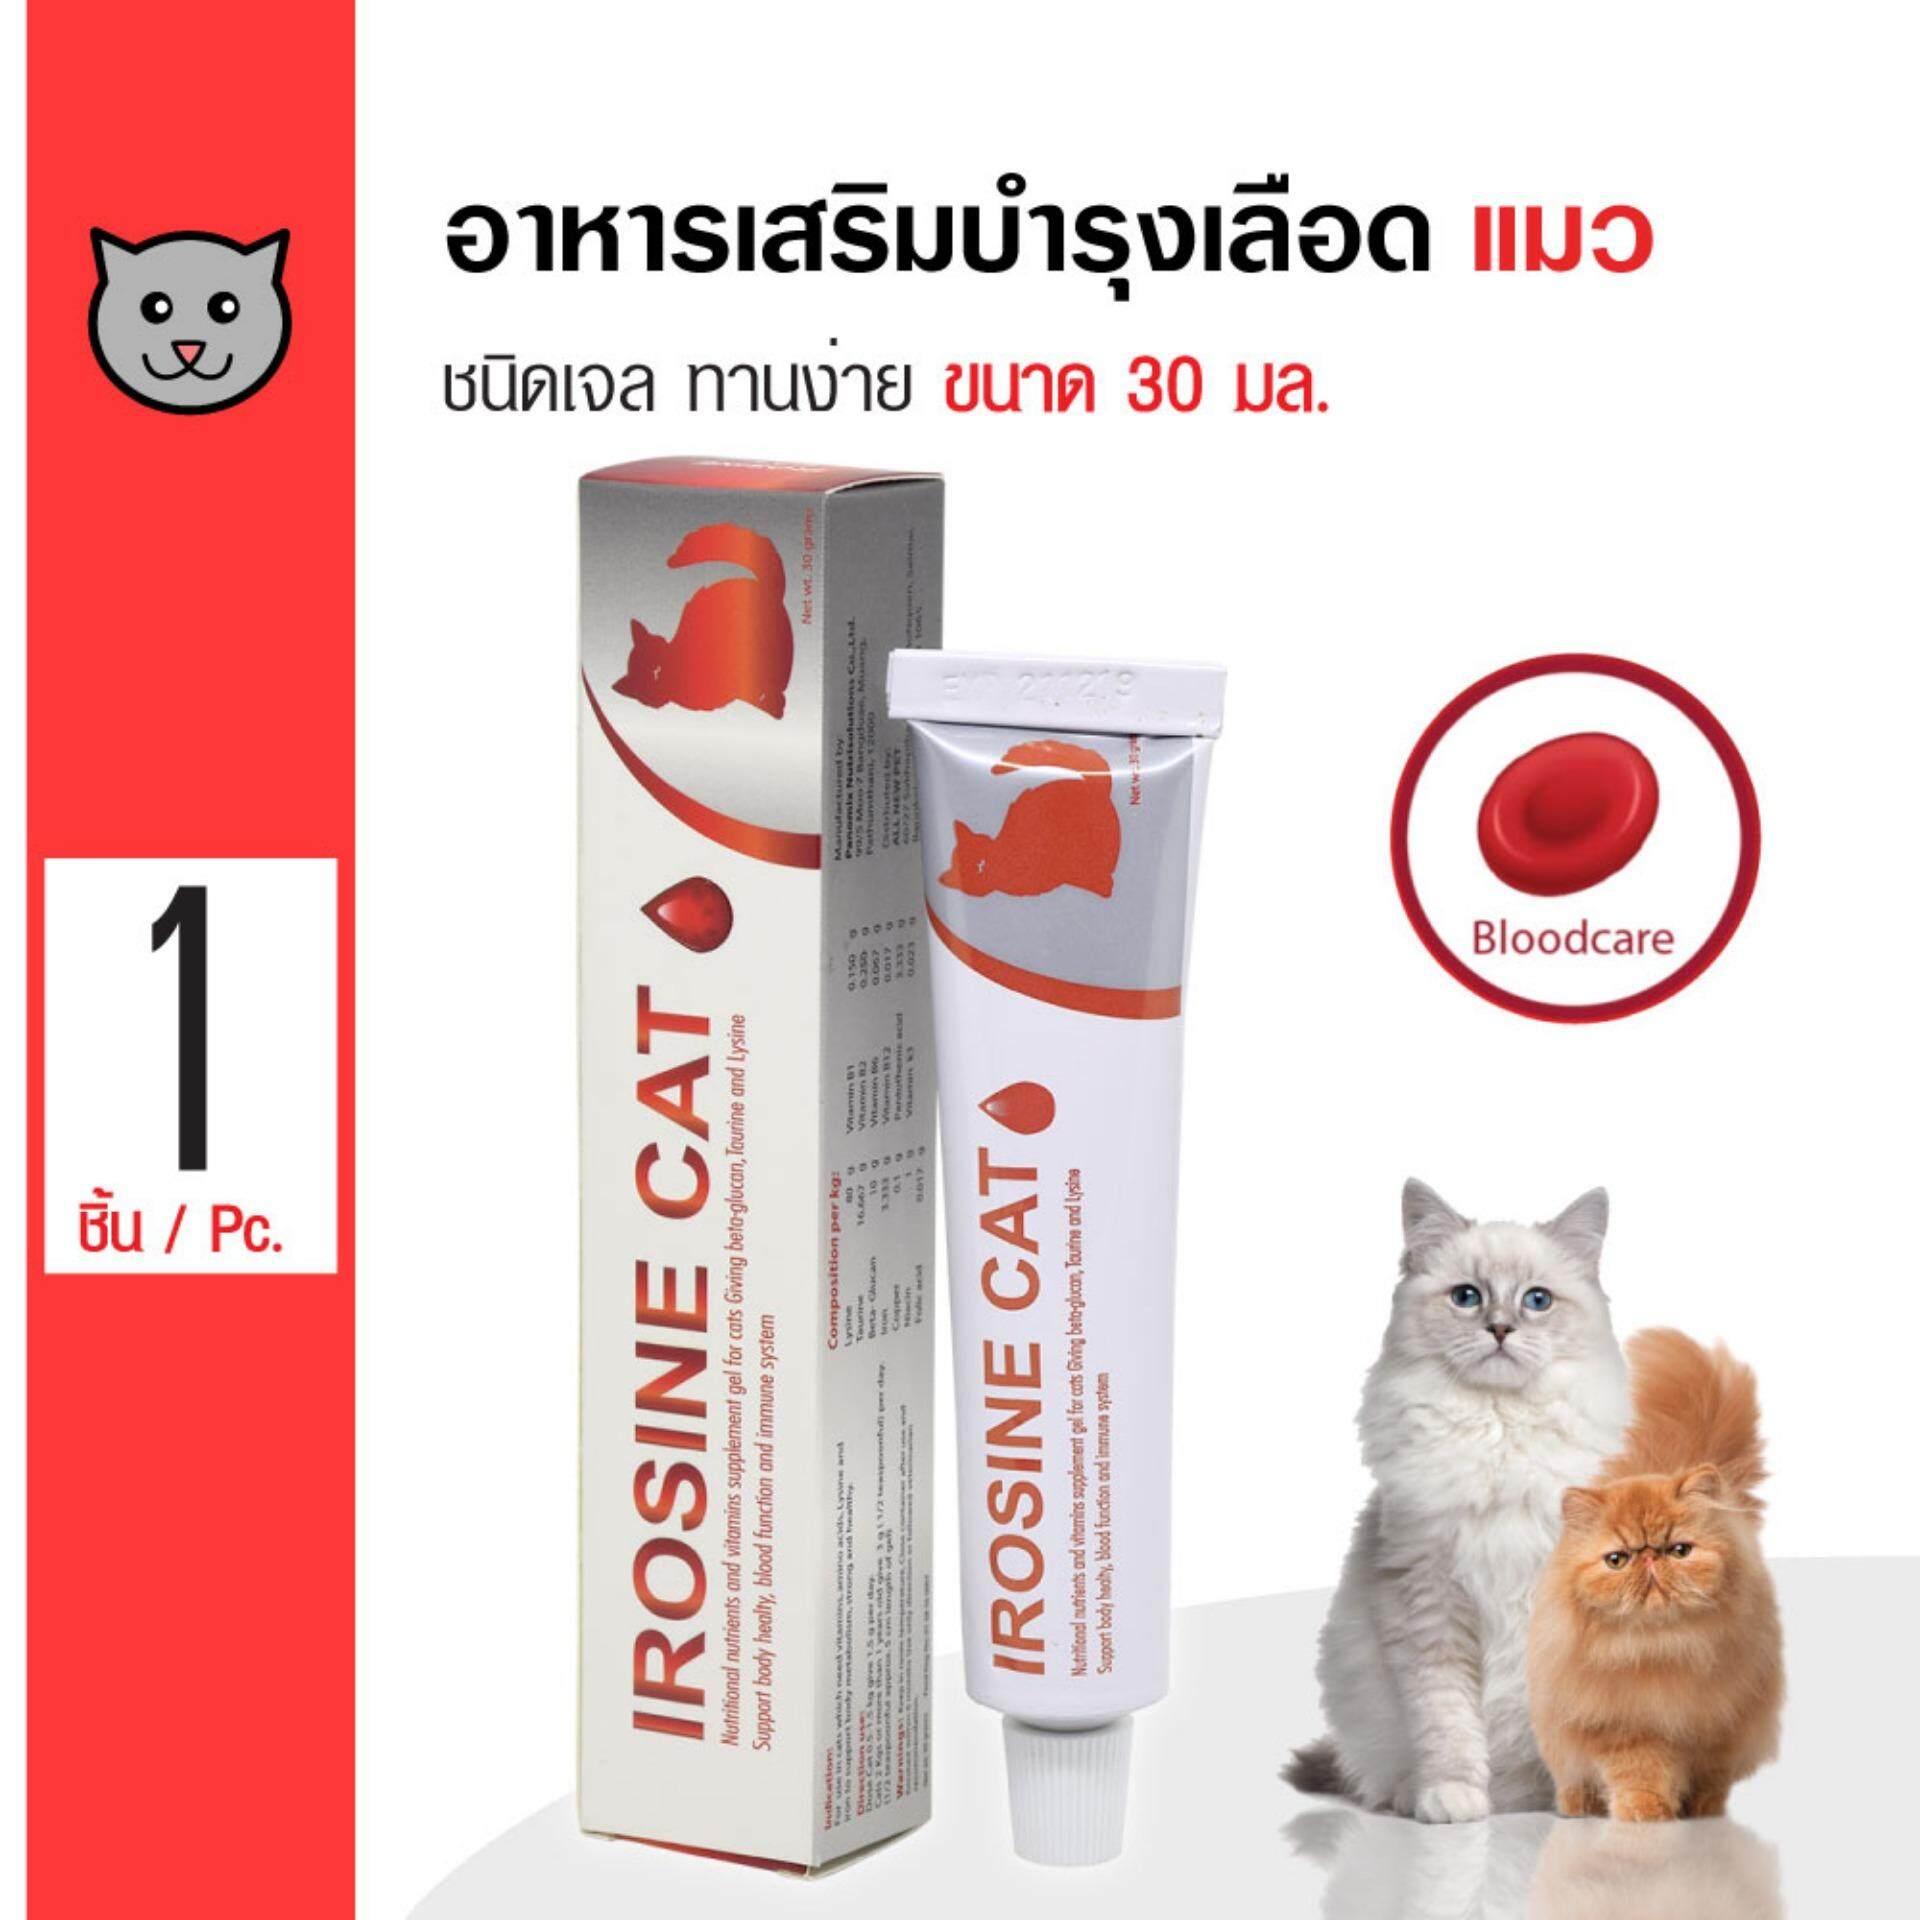 Irosine Cat อาหารเสริมแมว วิตามินบำรุงเลือดแมว ป้องกันโรคโลหิตจาง สำหรับแมวทุกวัย (30 กรัม/ชิ้น)